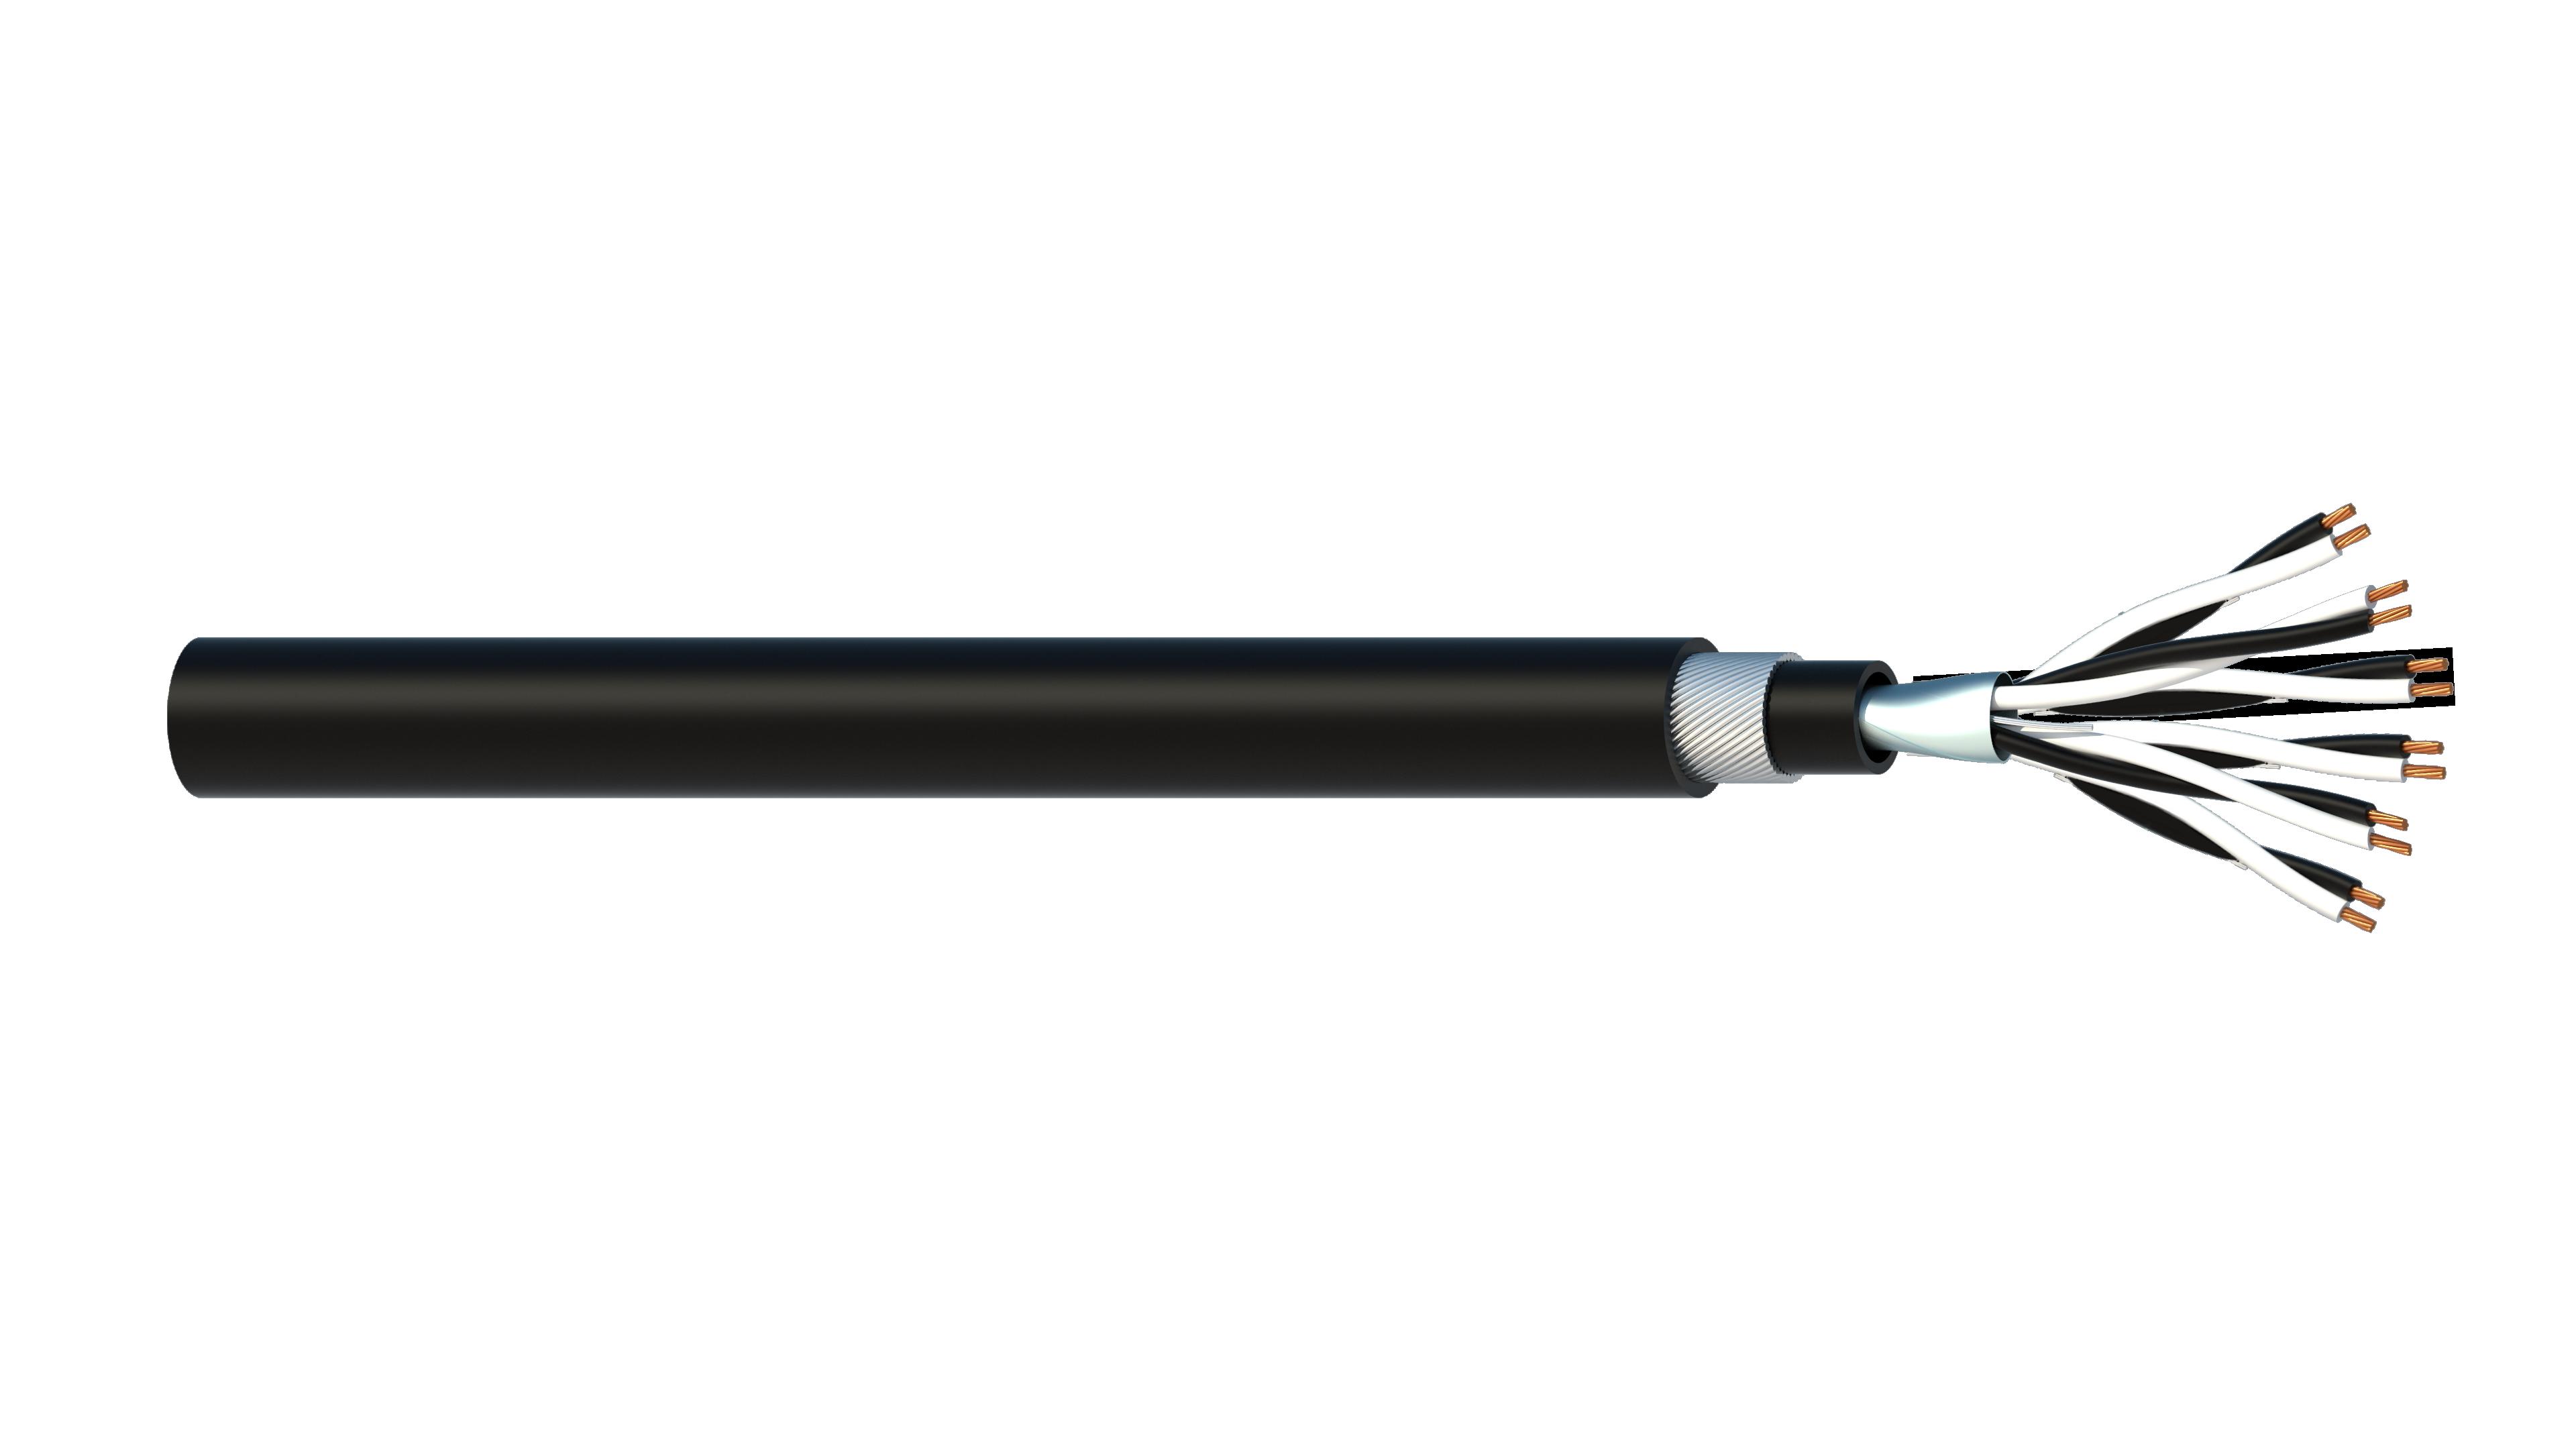 6 Pair 1.5mm2 Cu/PVC/OS/PVC/SWA/PVC Maser Instrumentation Cable - Black Sheath